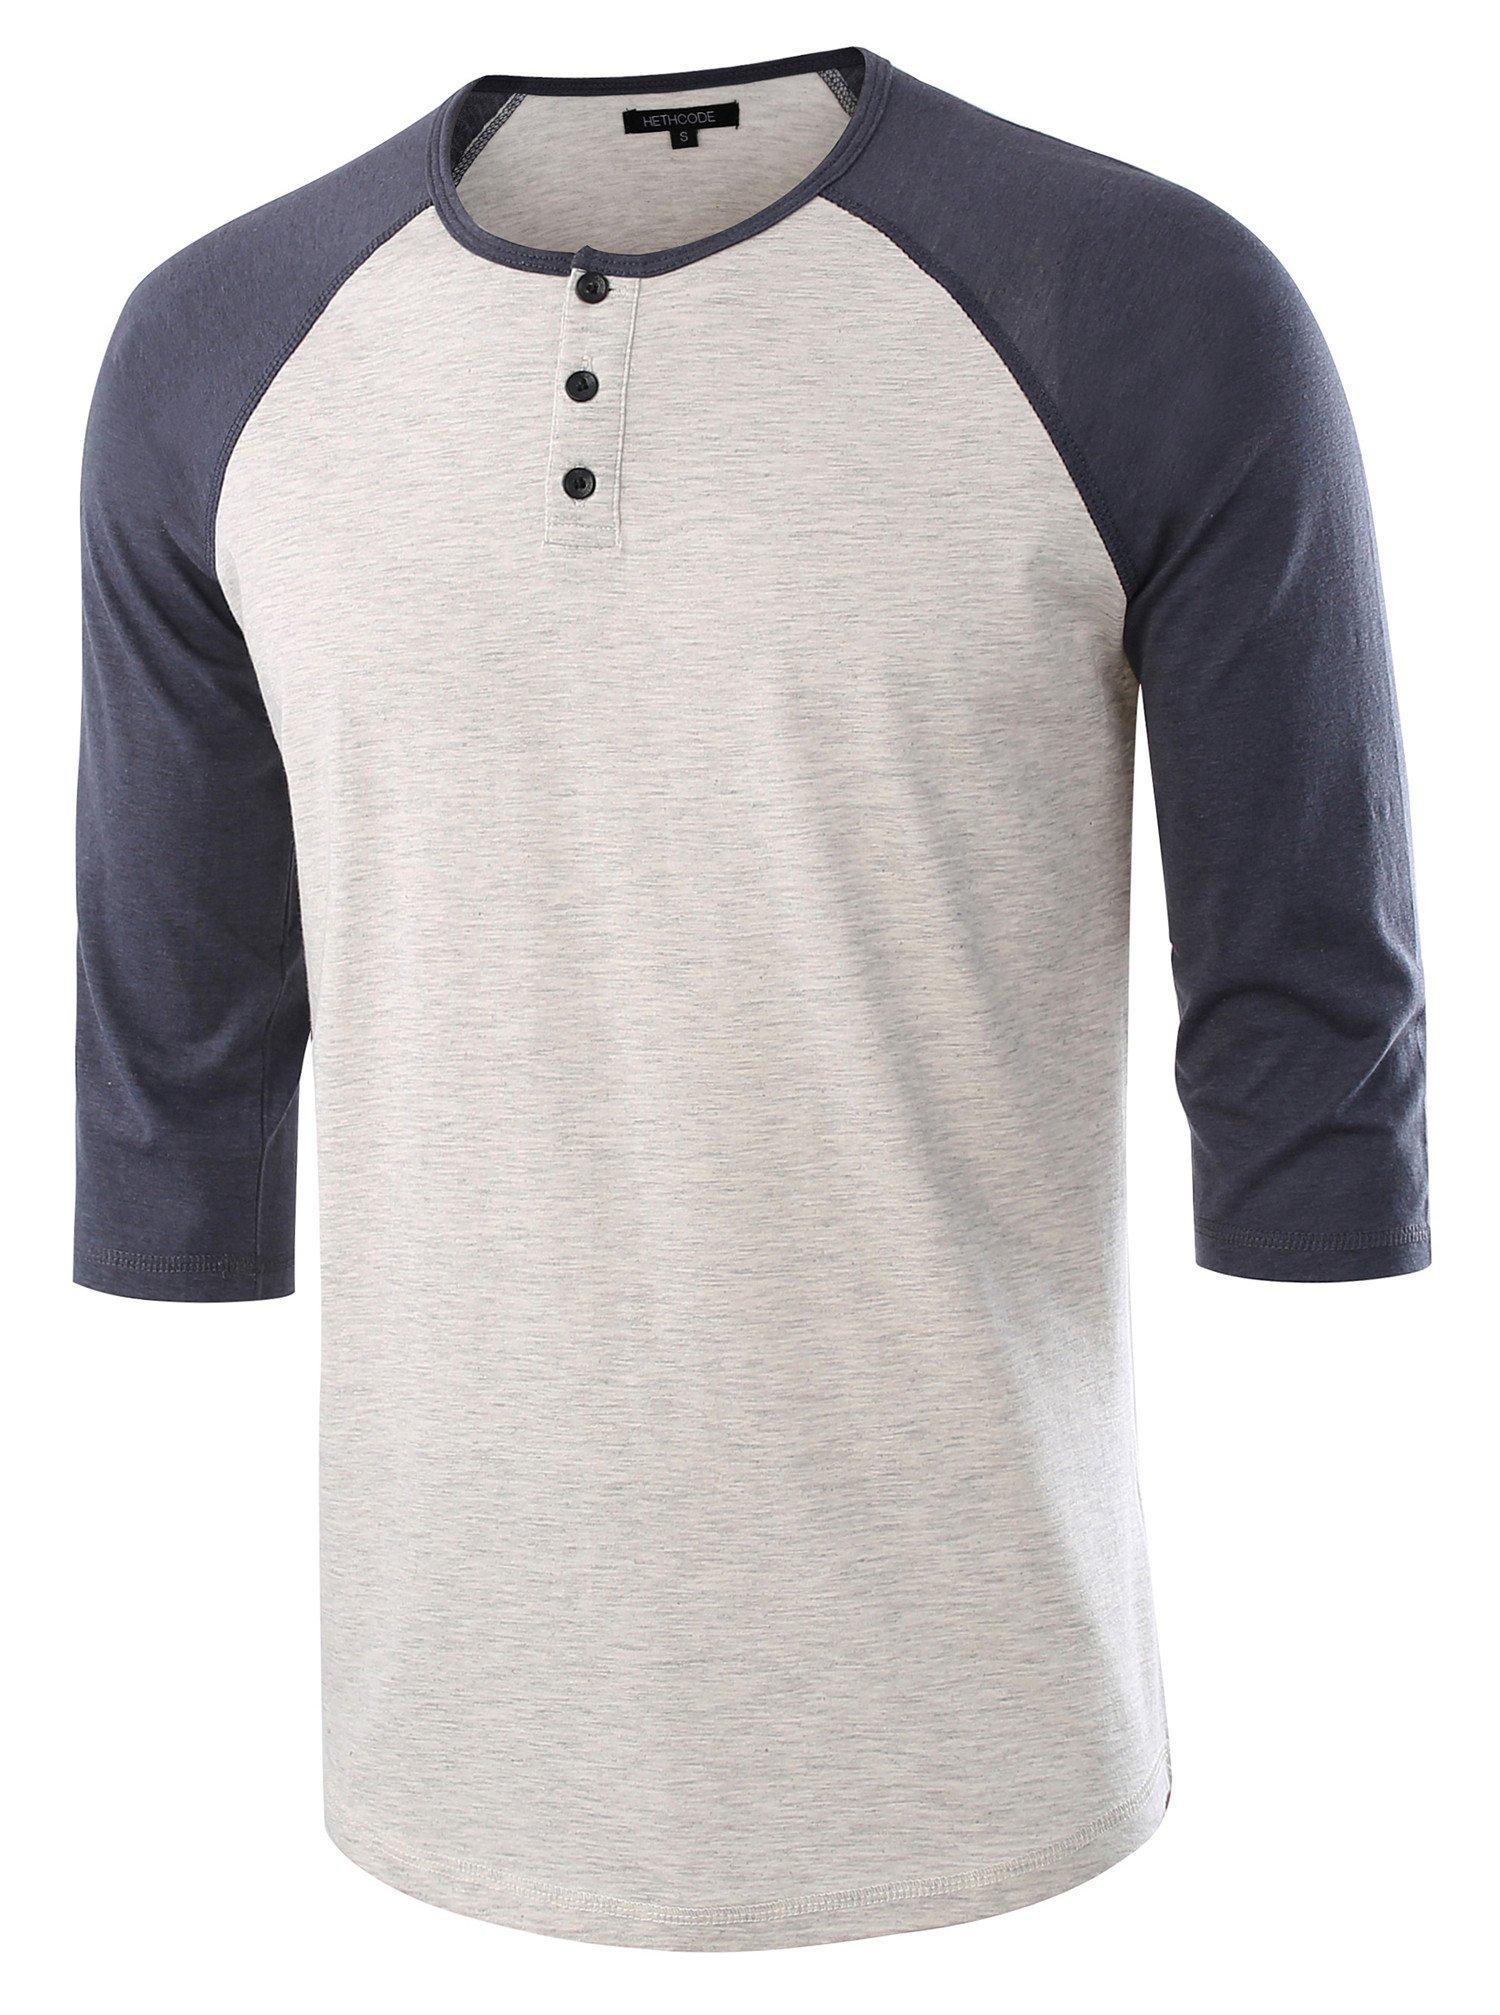 HETHCODE Men's Casual Raglan Fit Soft Baseball 3/4 Sleeve Henley T-Shirts Tee H.Oatmeal/C.Blue L by HETHCODE